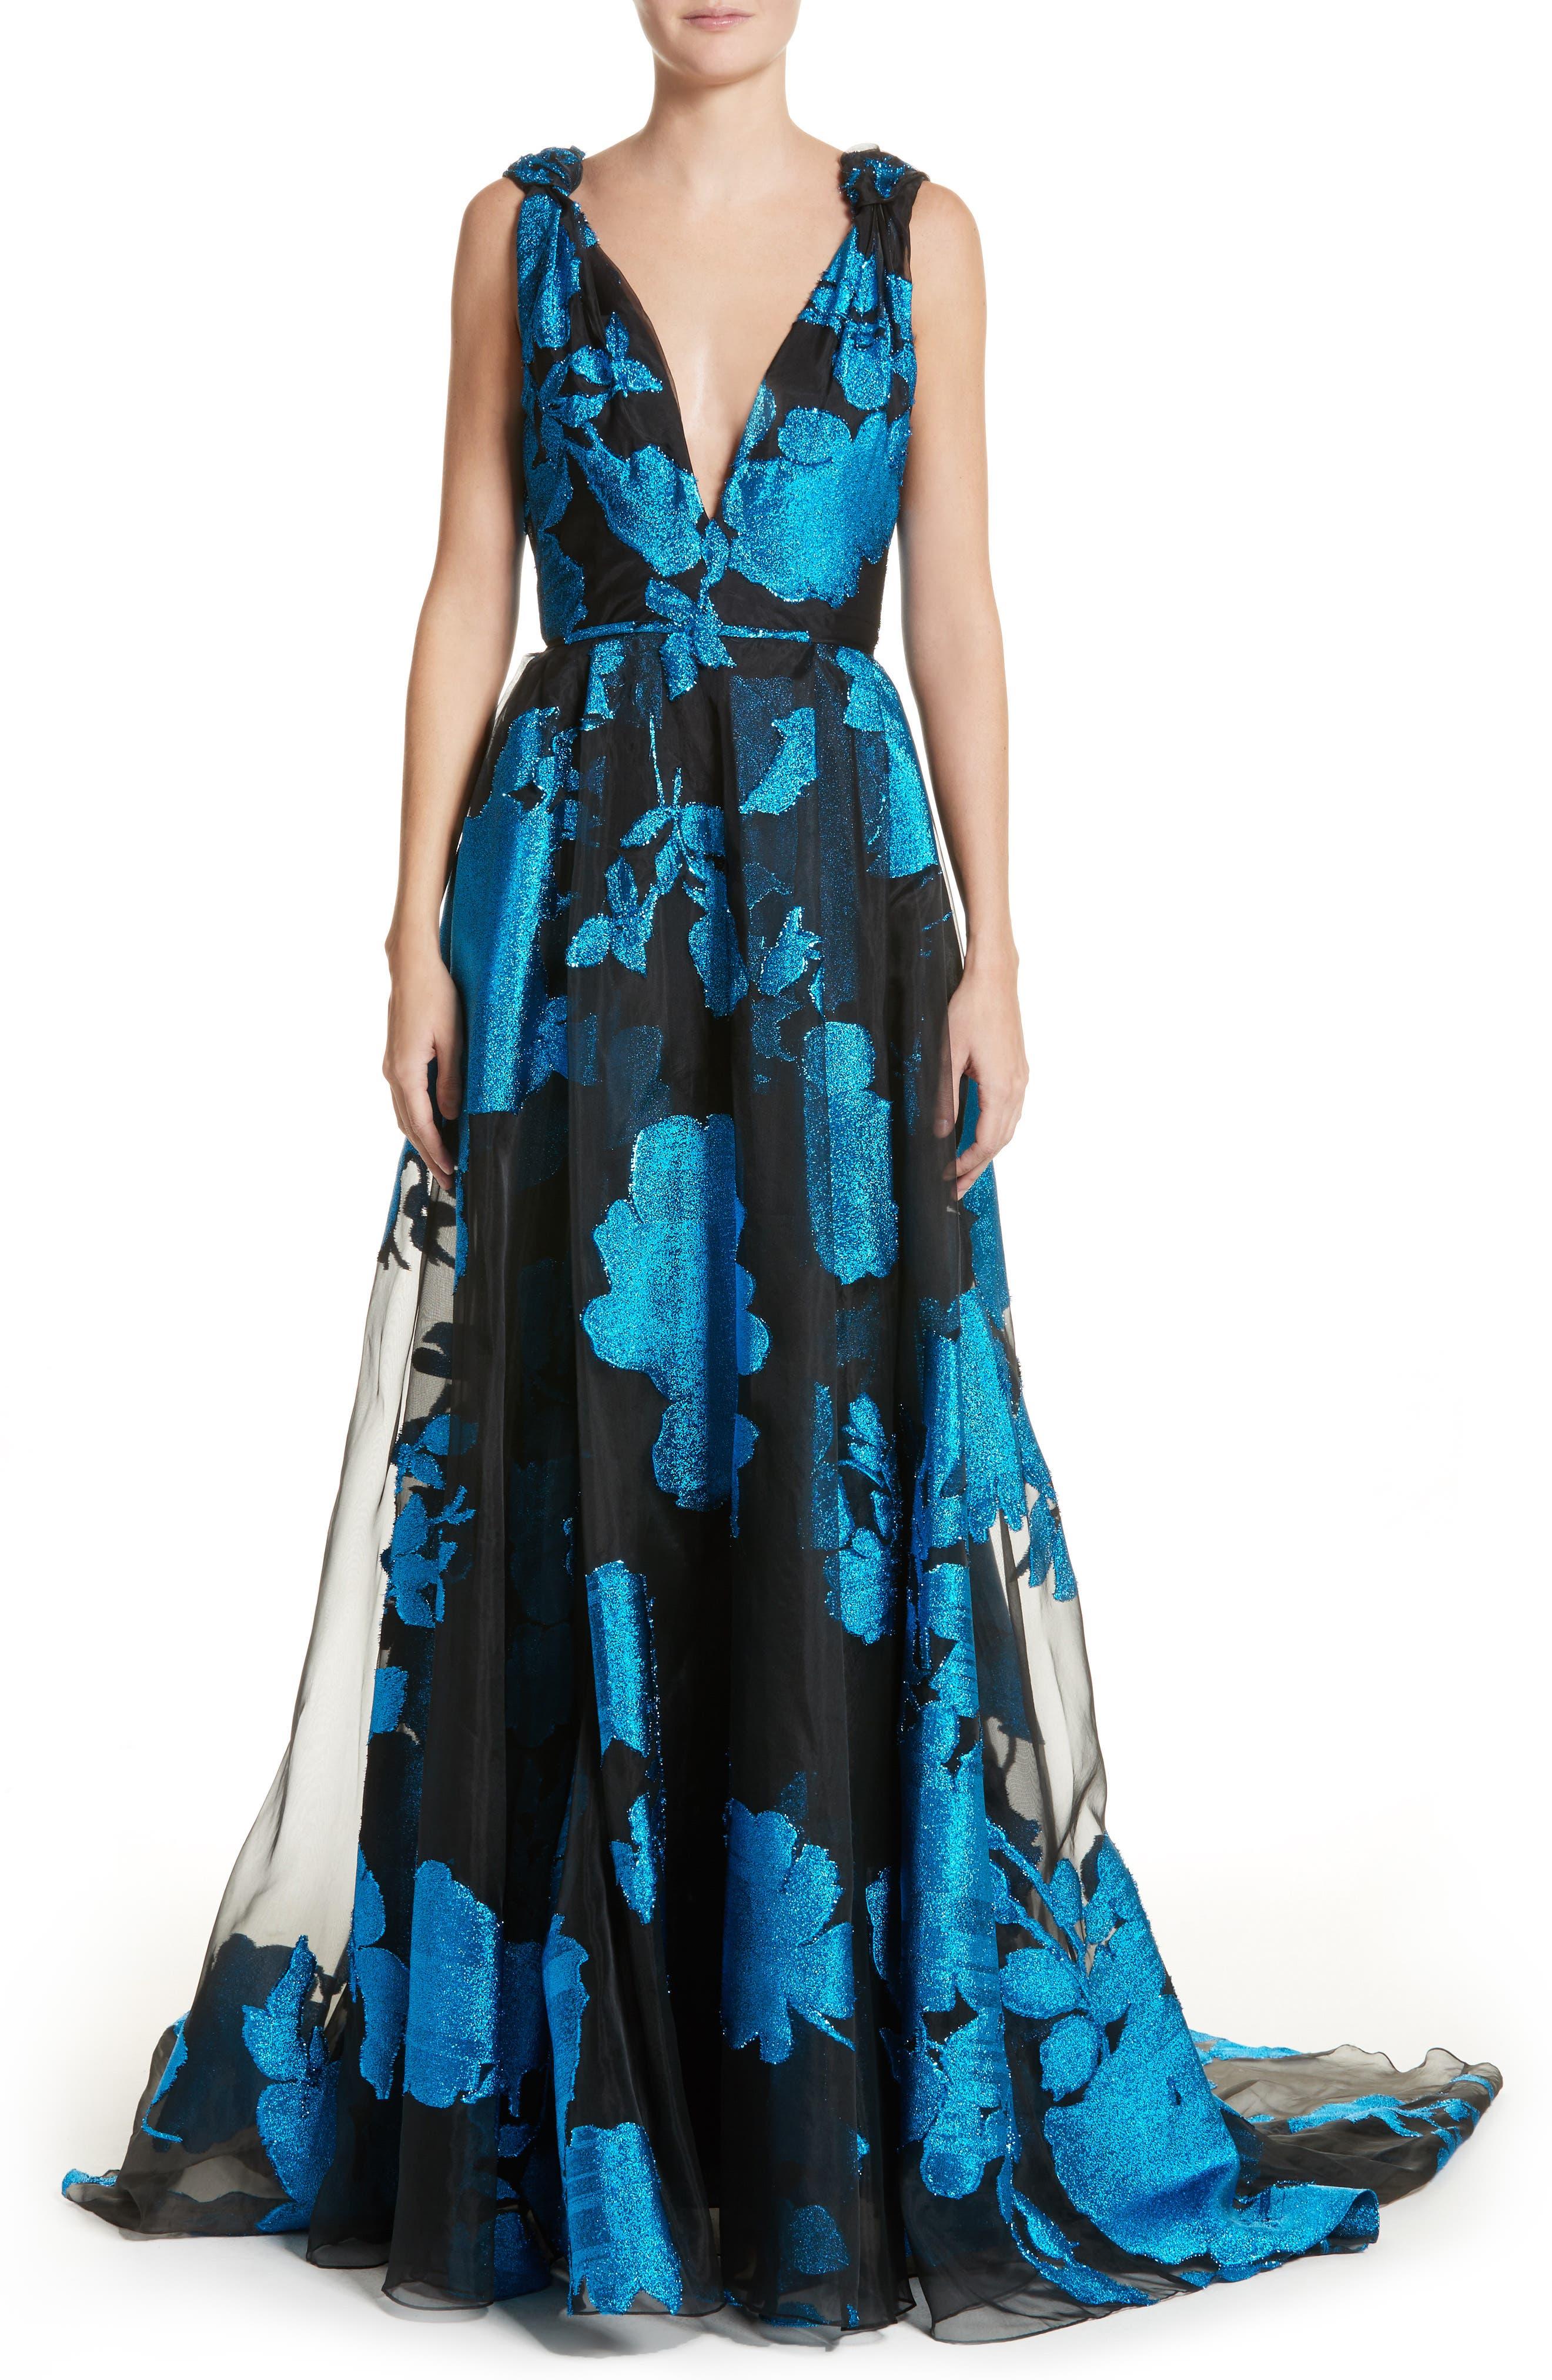 Main Image - Carolina Herrera Metallic Floral Chiffon Gown